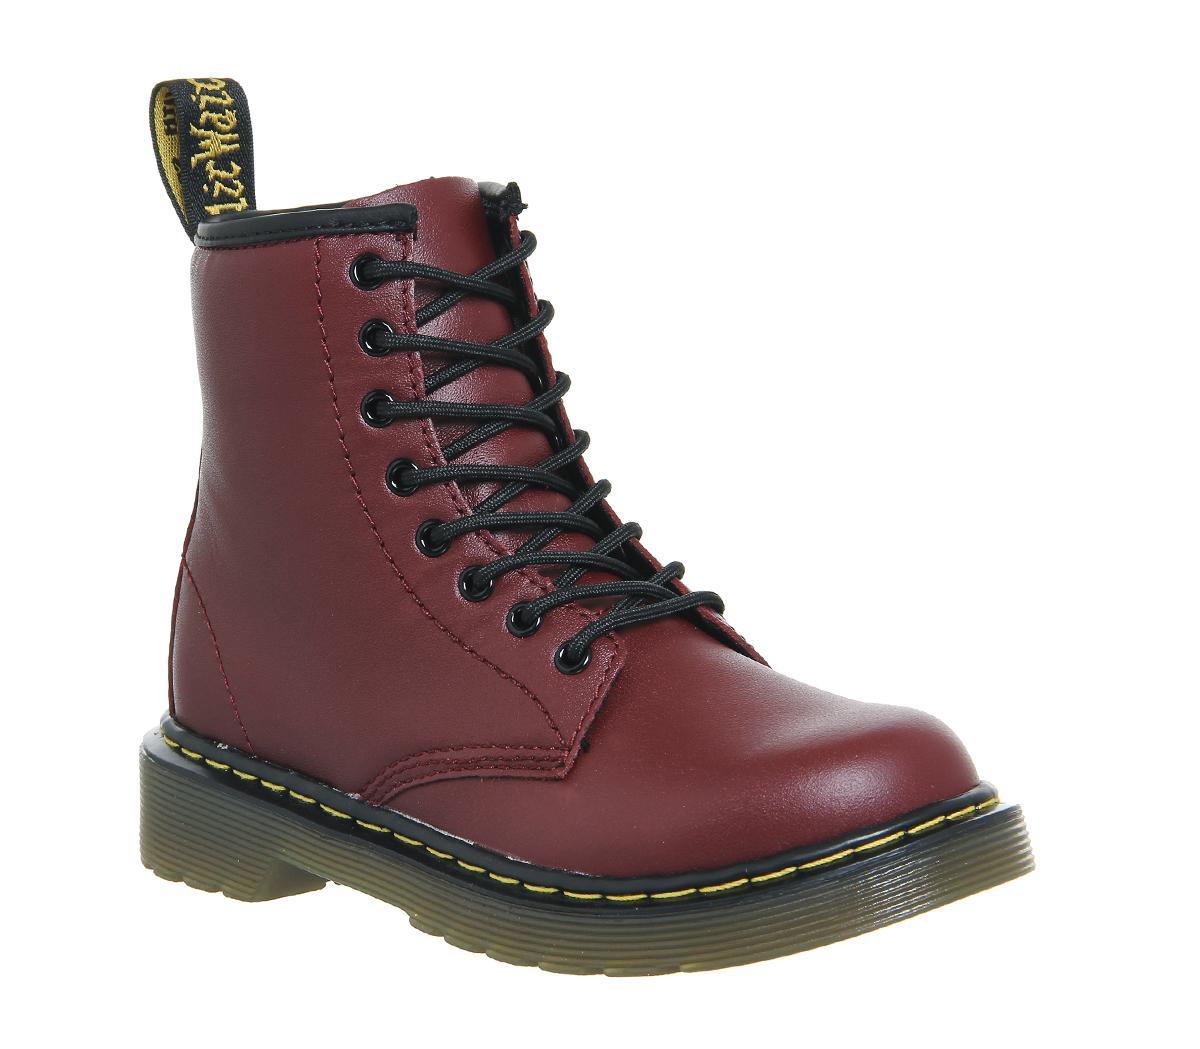 Junior Lace Up Boots Inside Zip Delaney